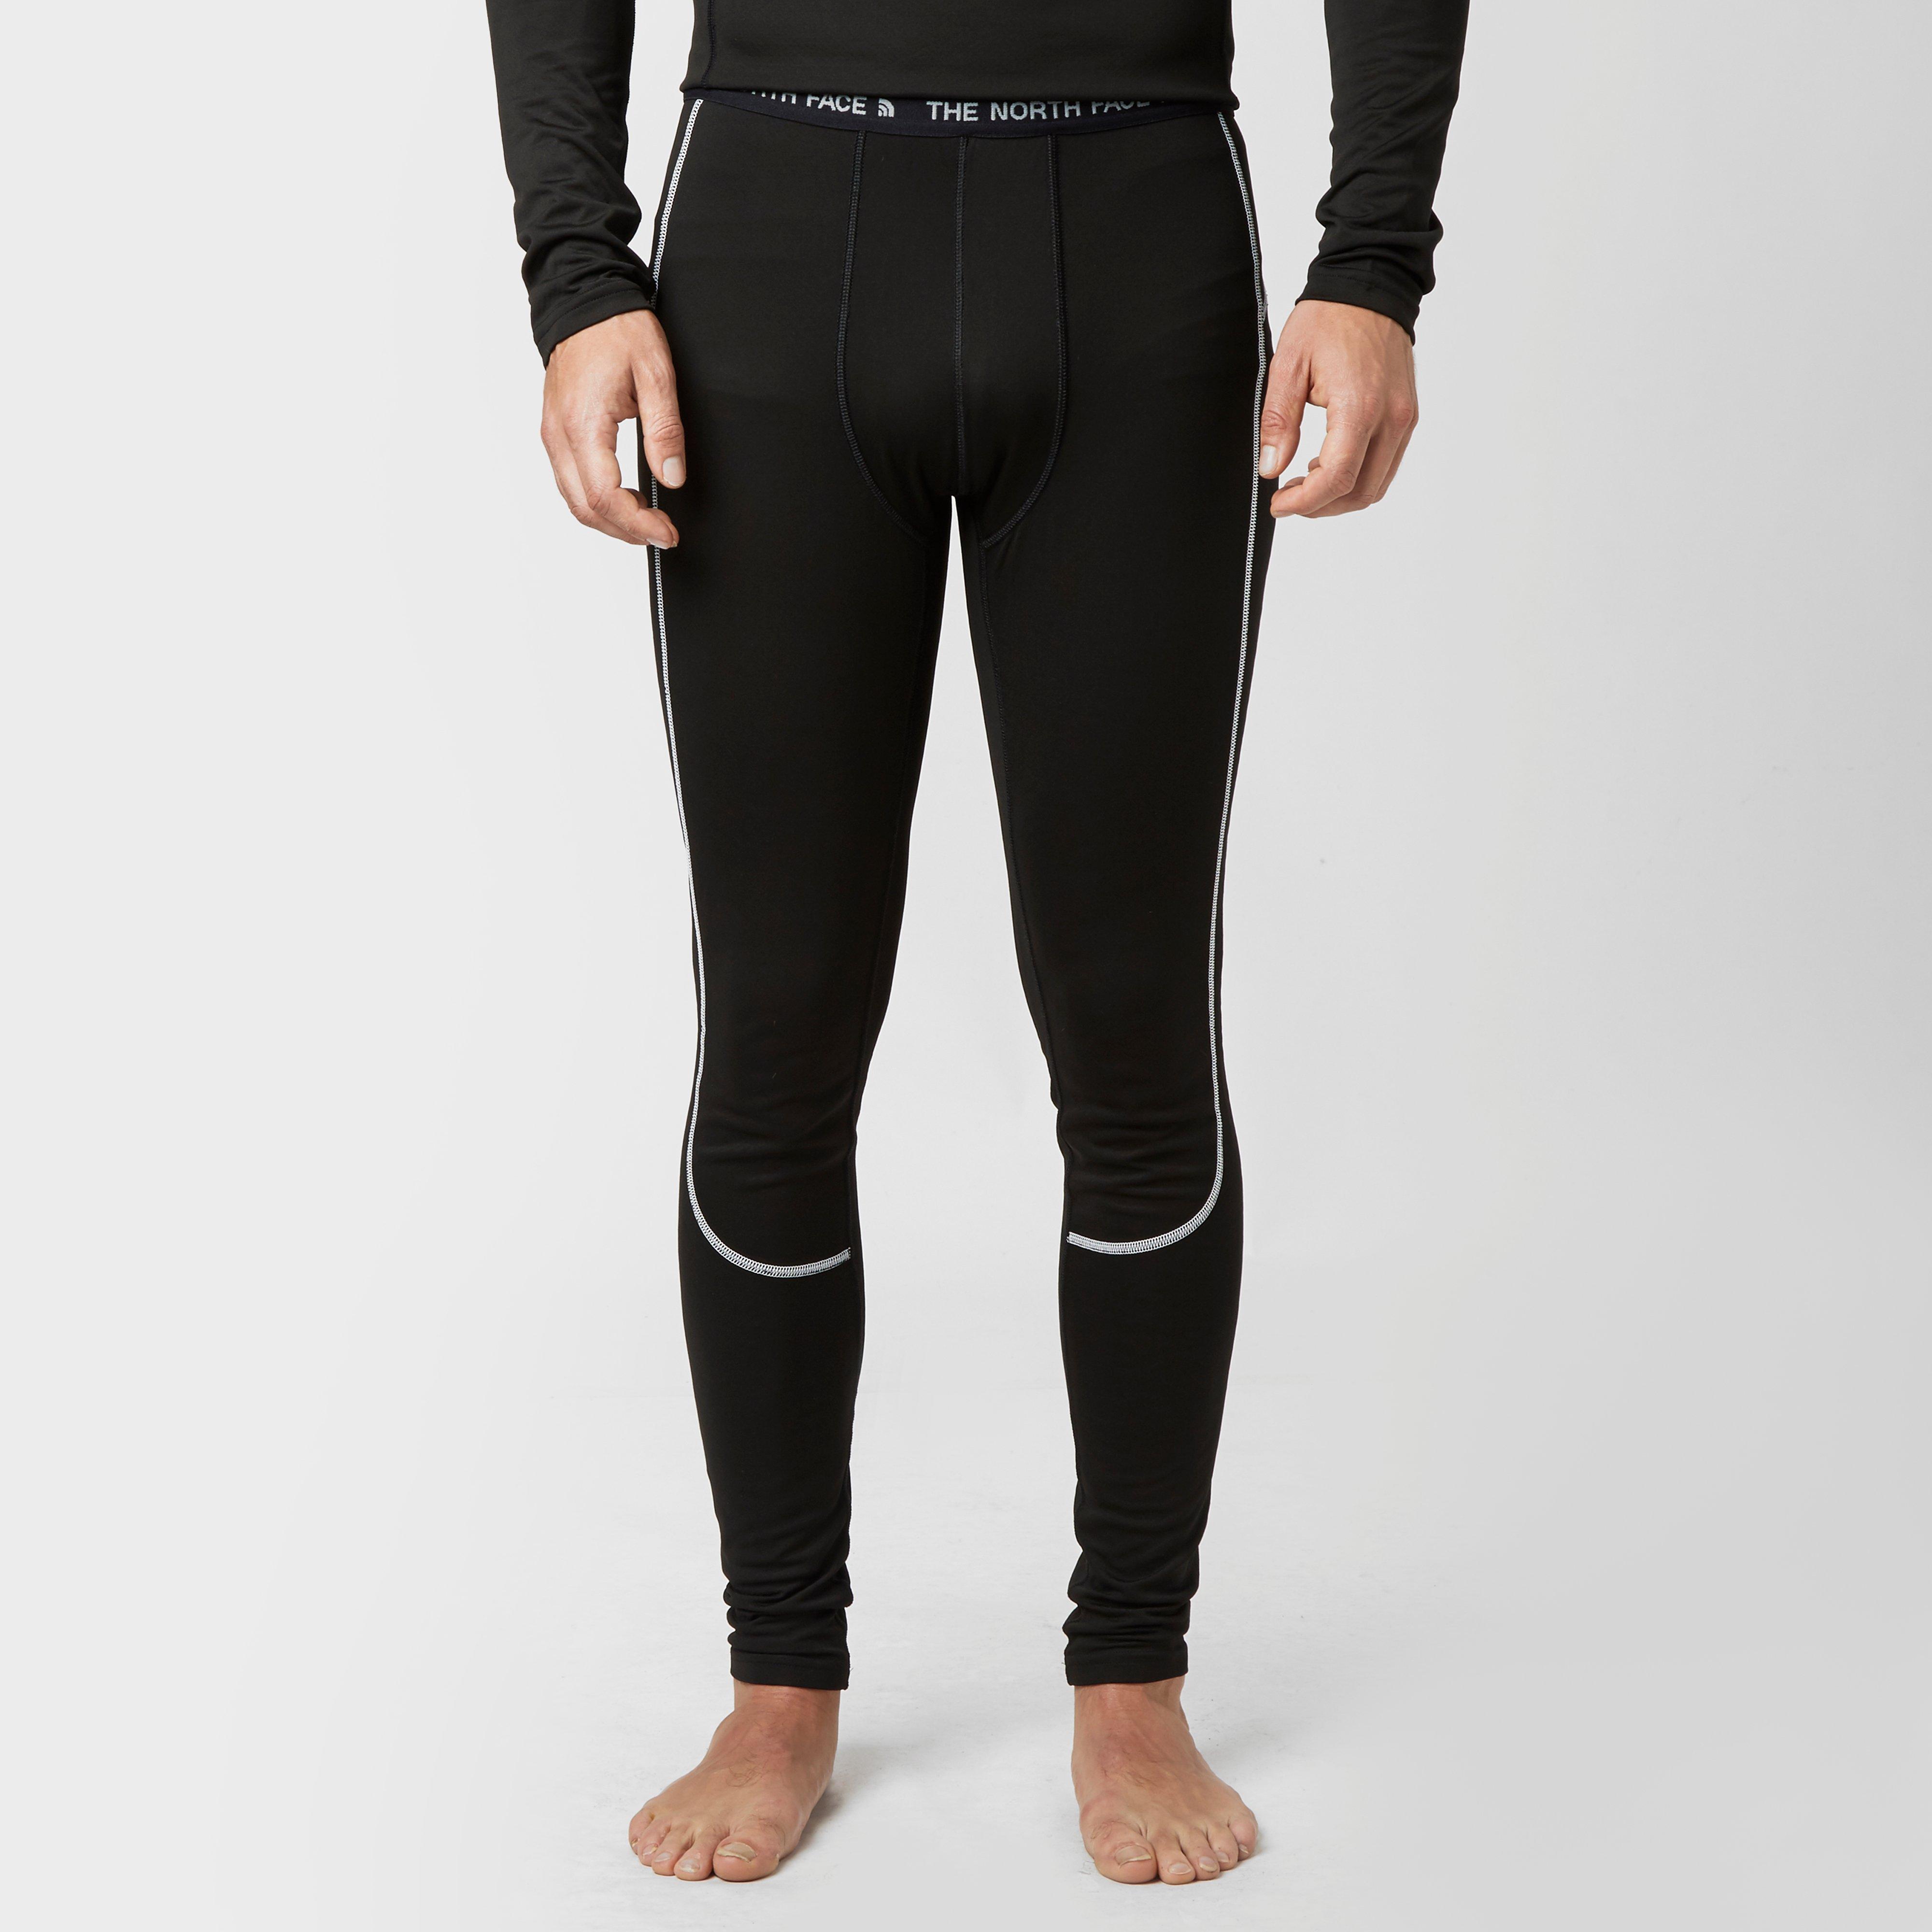 The North Face Men's Warm Tights - Black, Black Review thumbnail